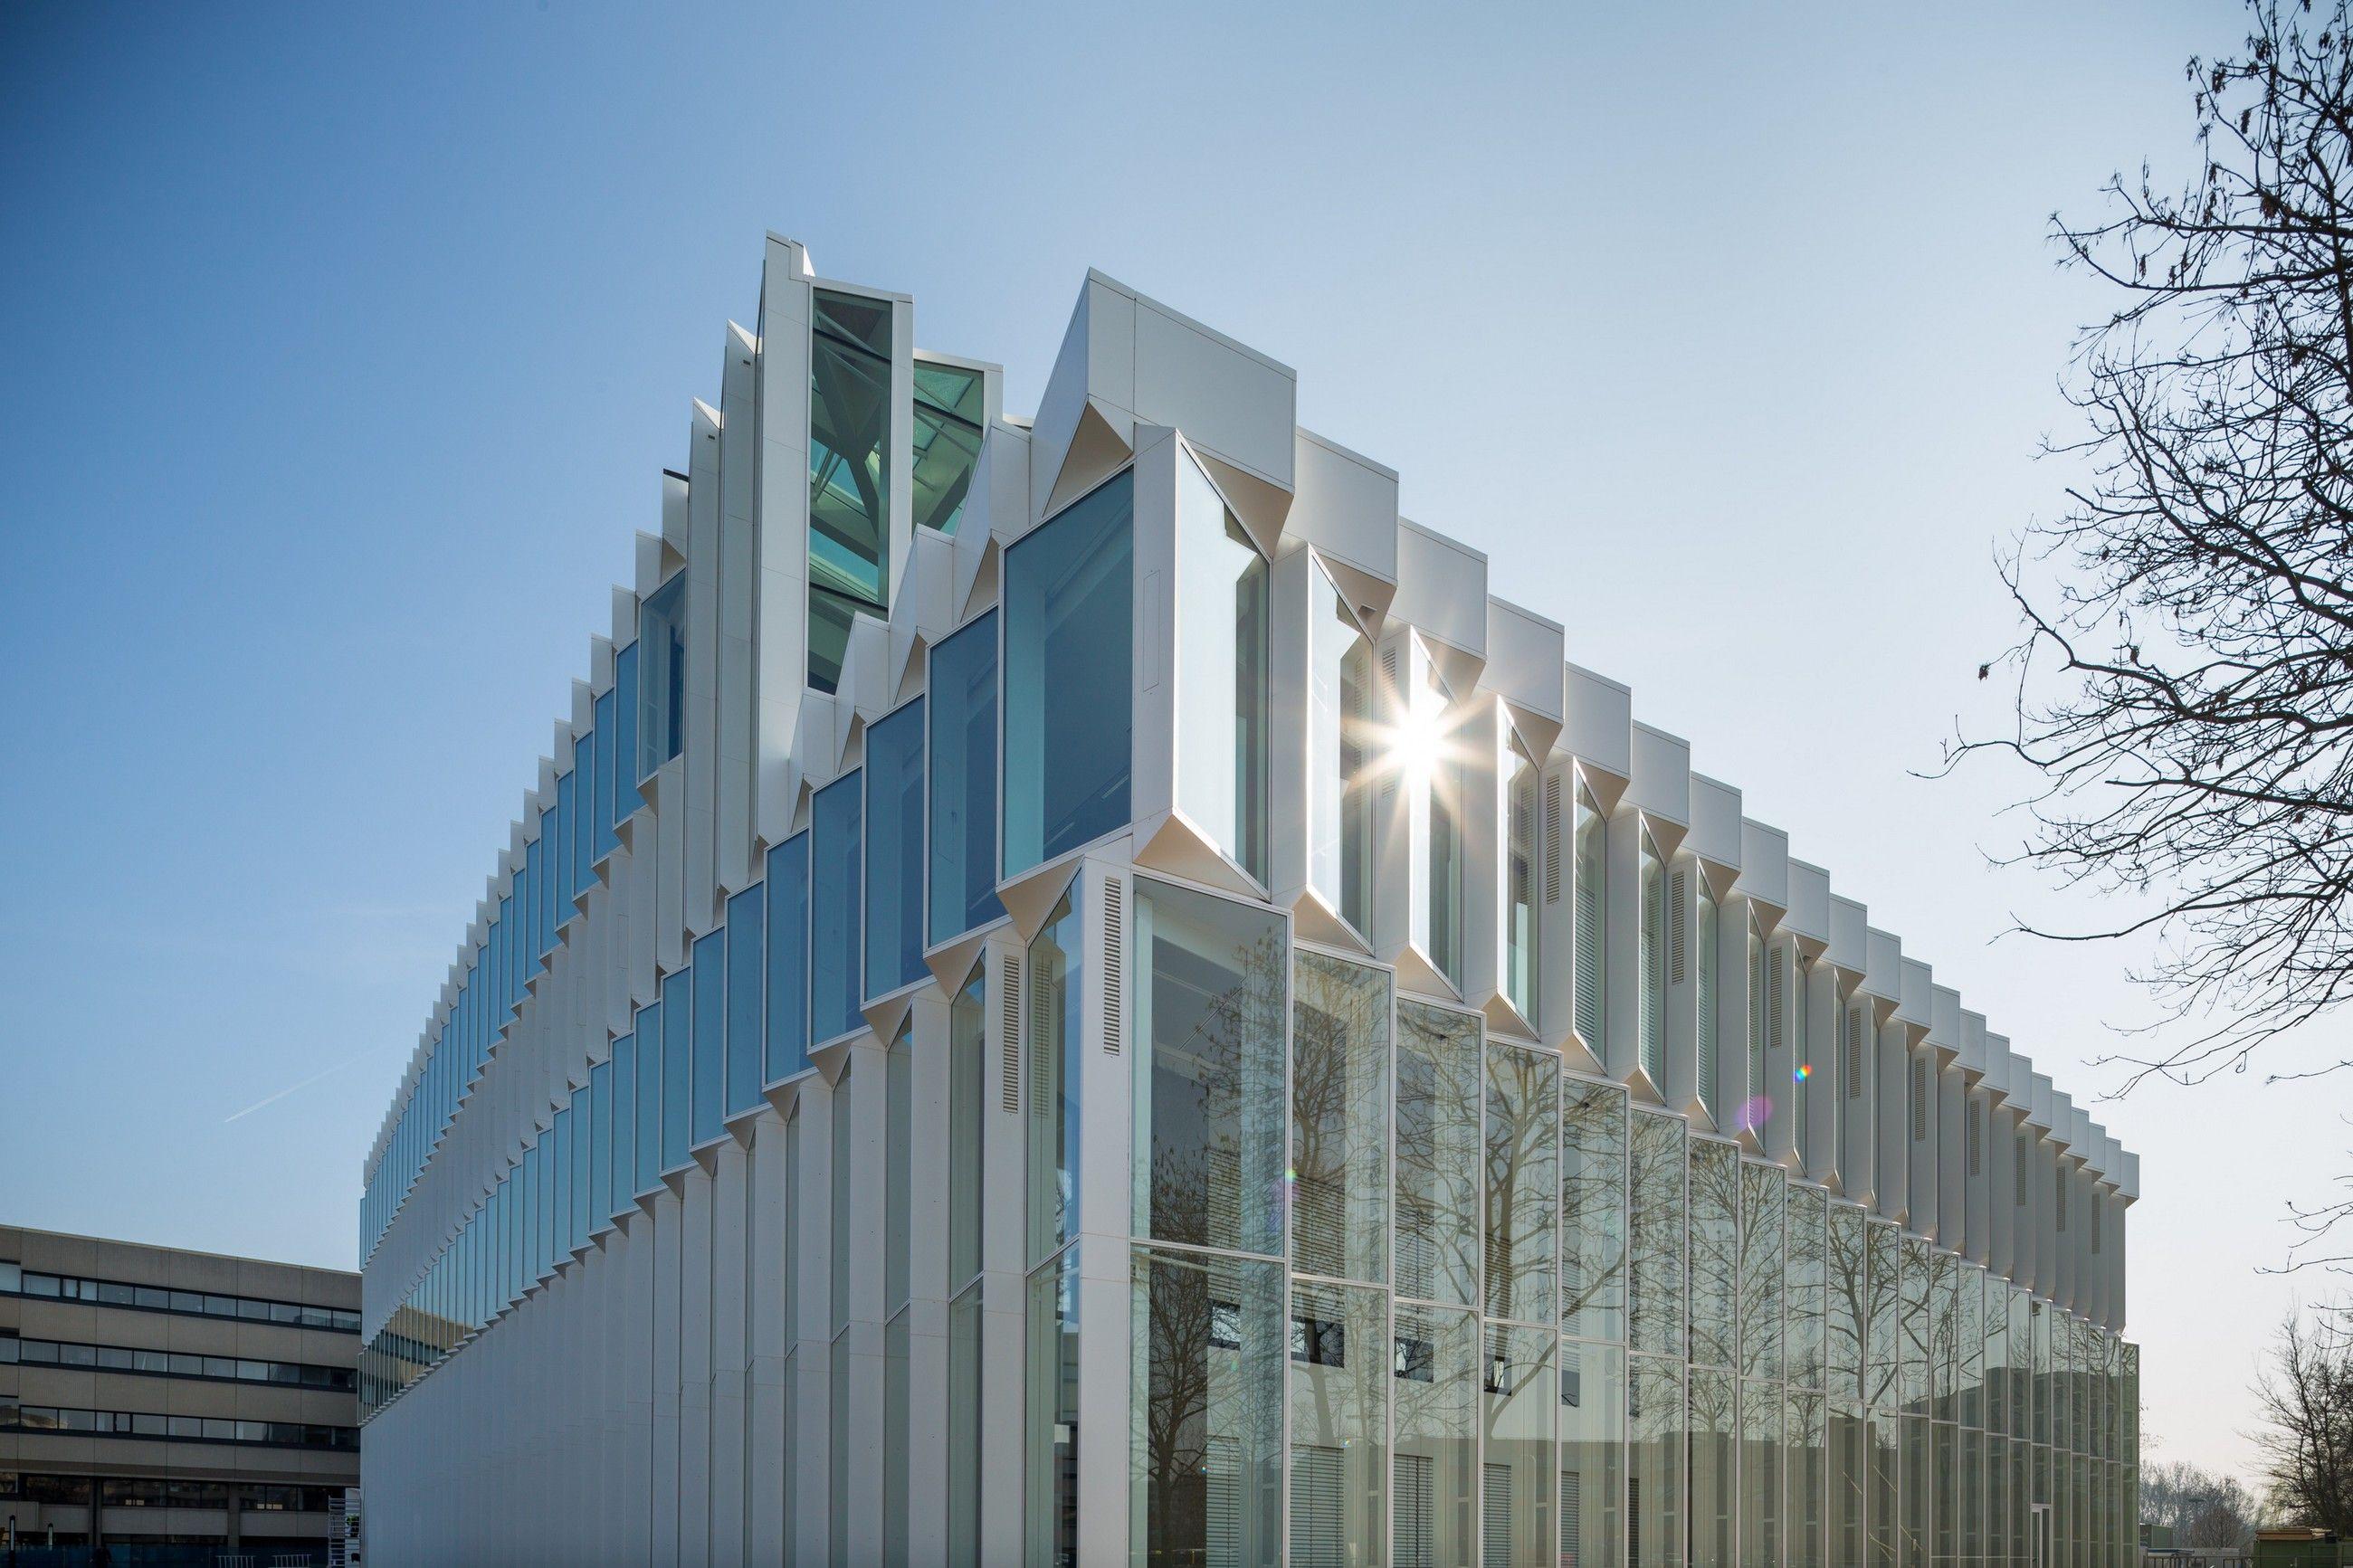 Asr headquarters team v architecture axalta powder